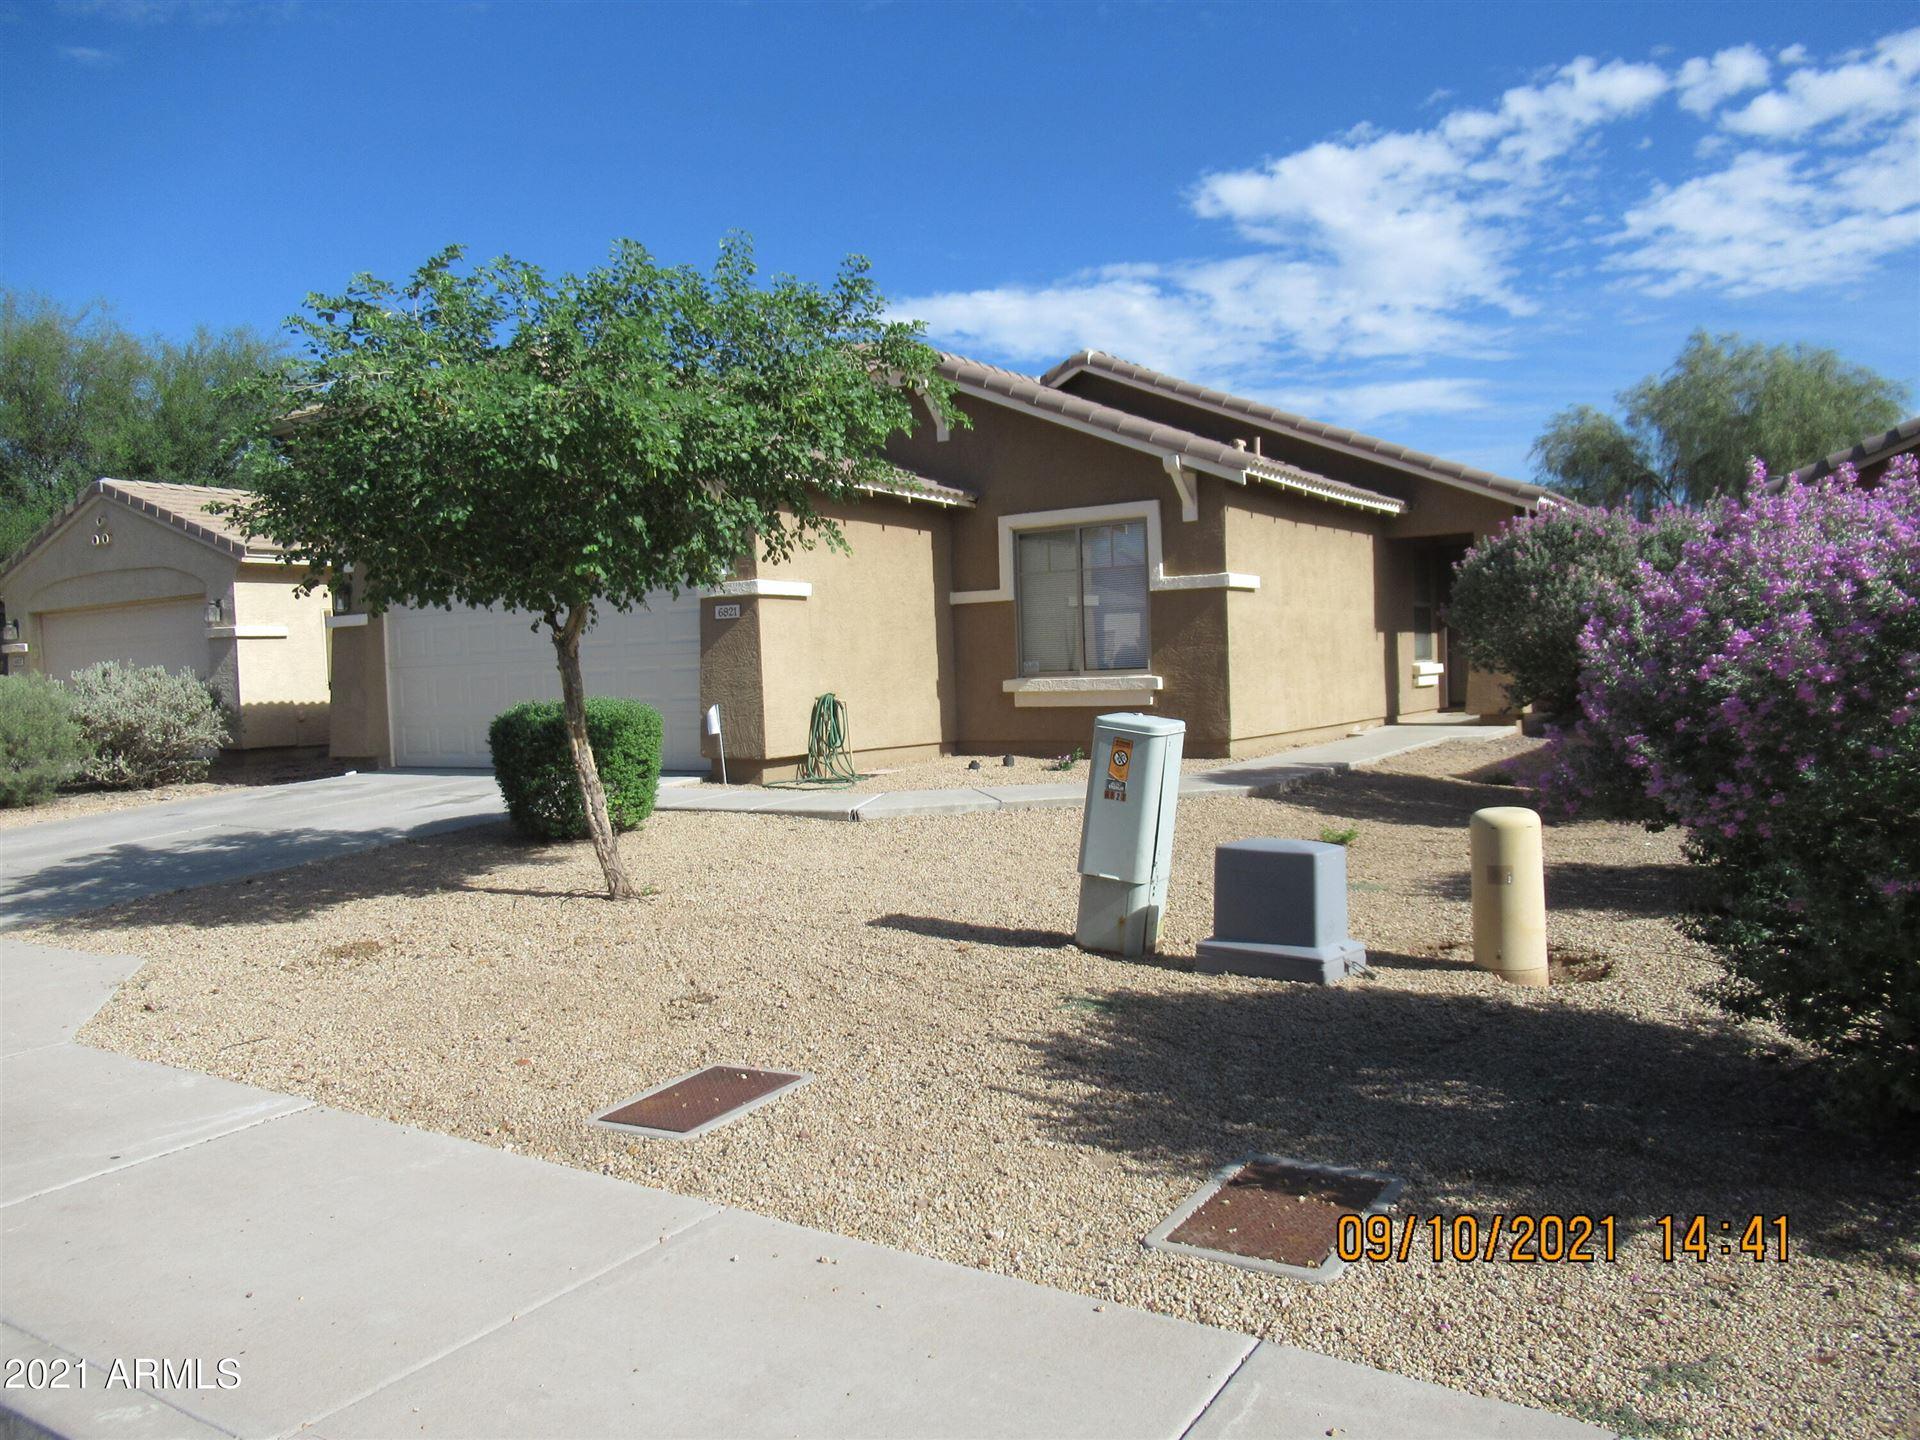 Photo of 6821 W GARY Way, Laveen, AZ 85339 (MLS # 6305400)